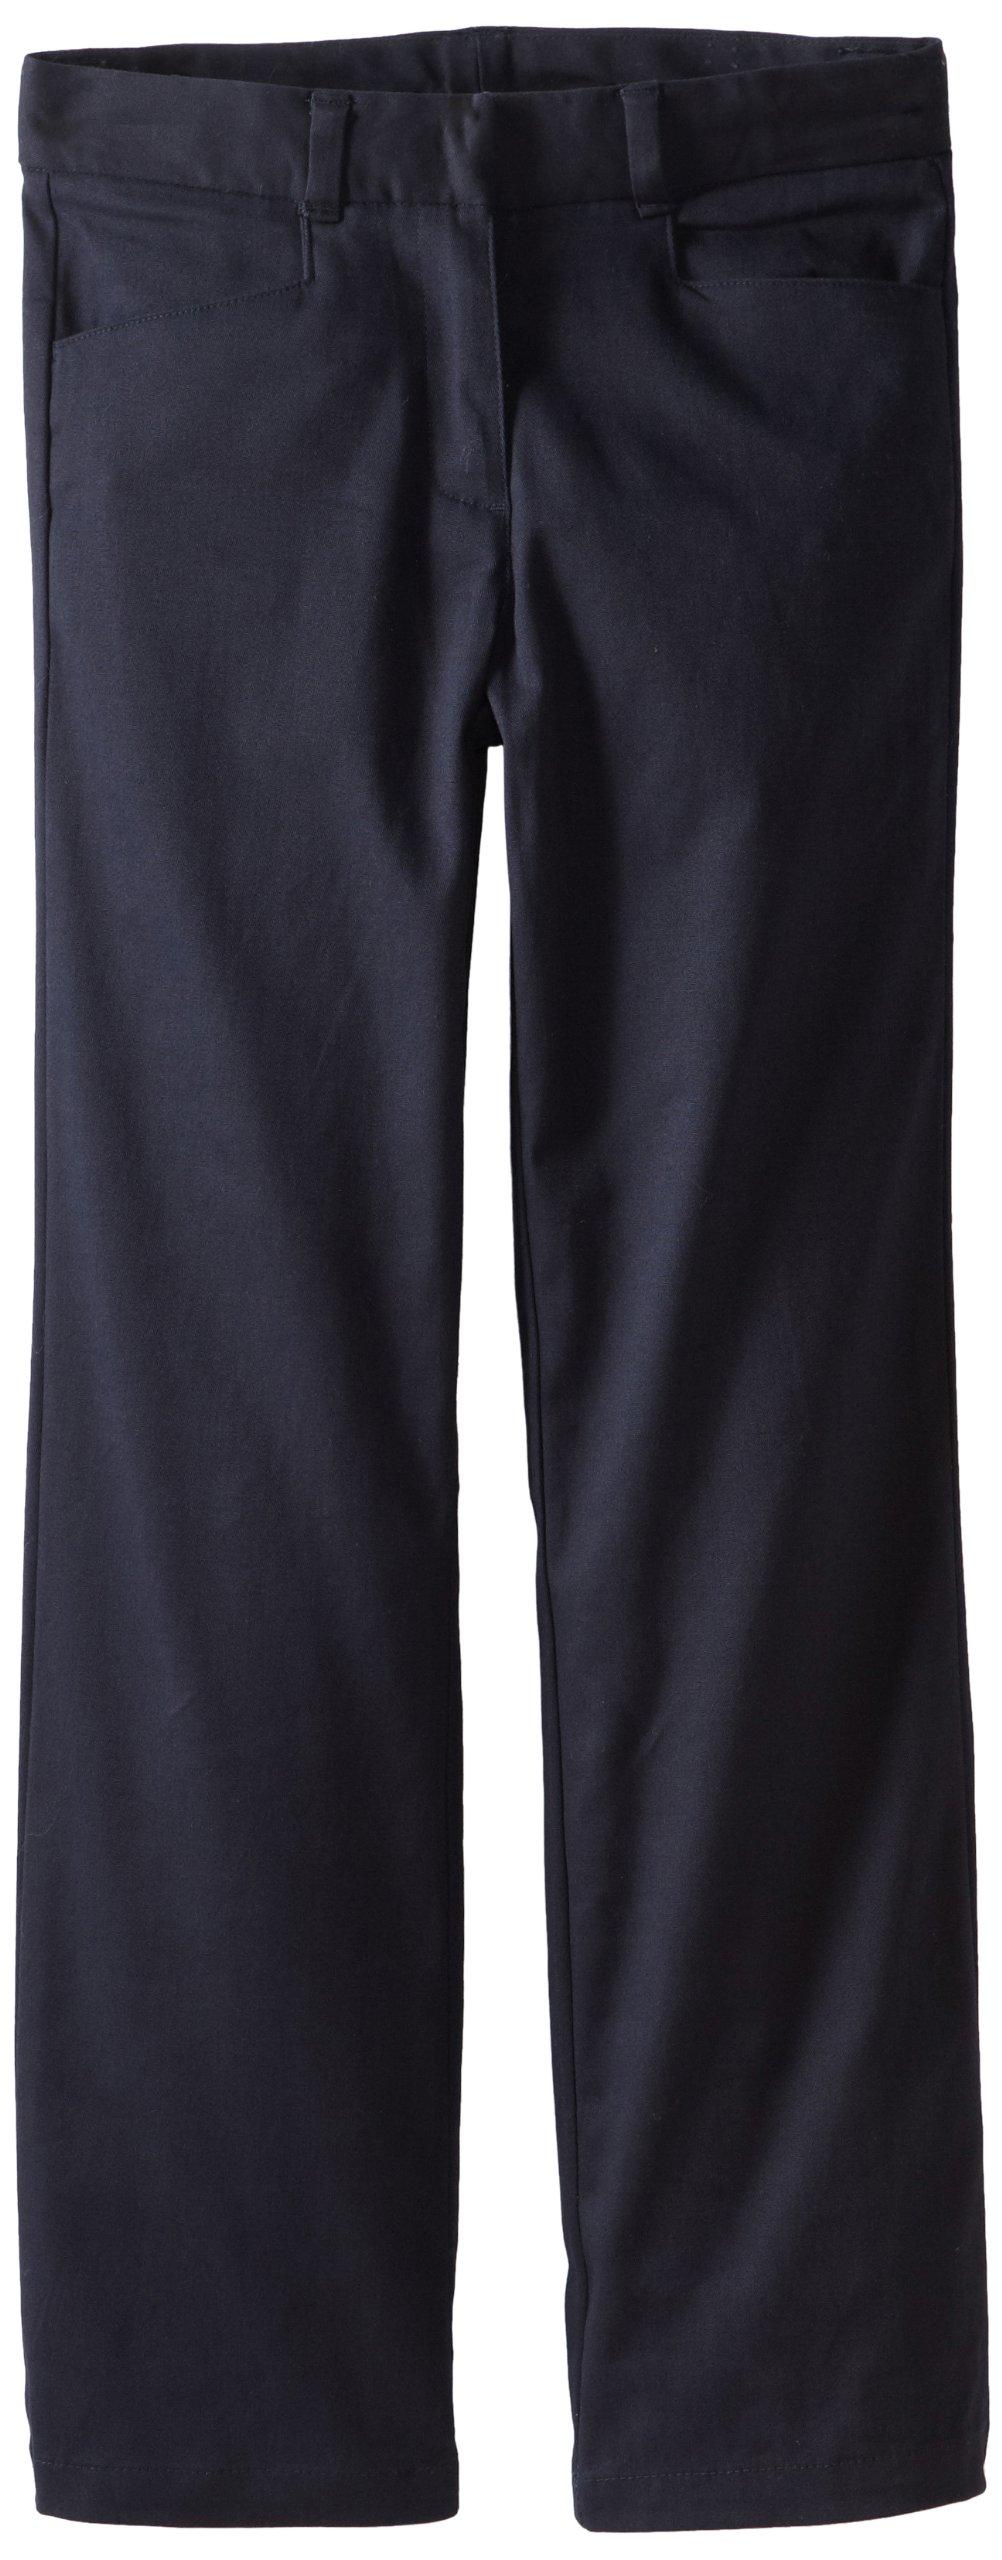 Nautica Big Girls' Uniform Stretch Twill Bootcut Pant, Su Navy,7 by Nautica (Image #1)